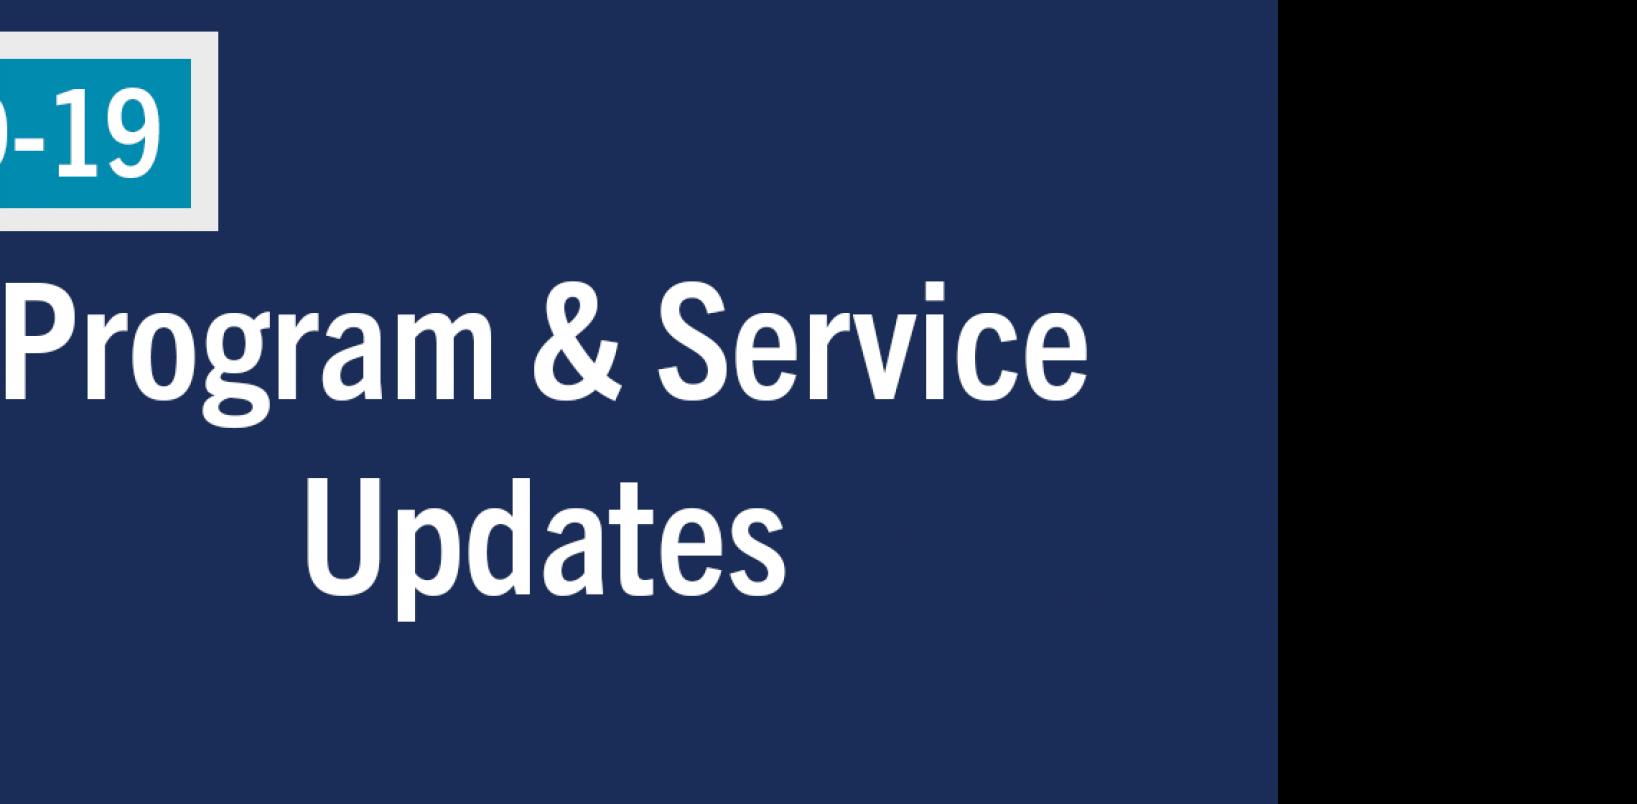 COVID-19 Program & Service Updates